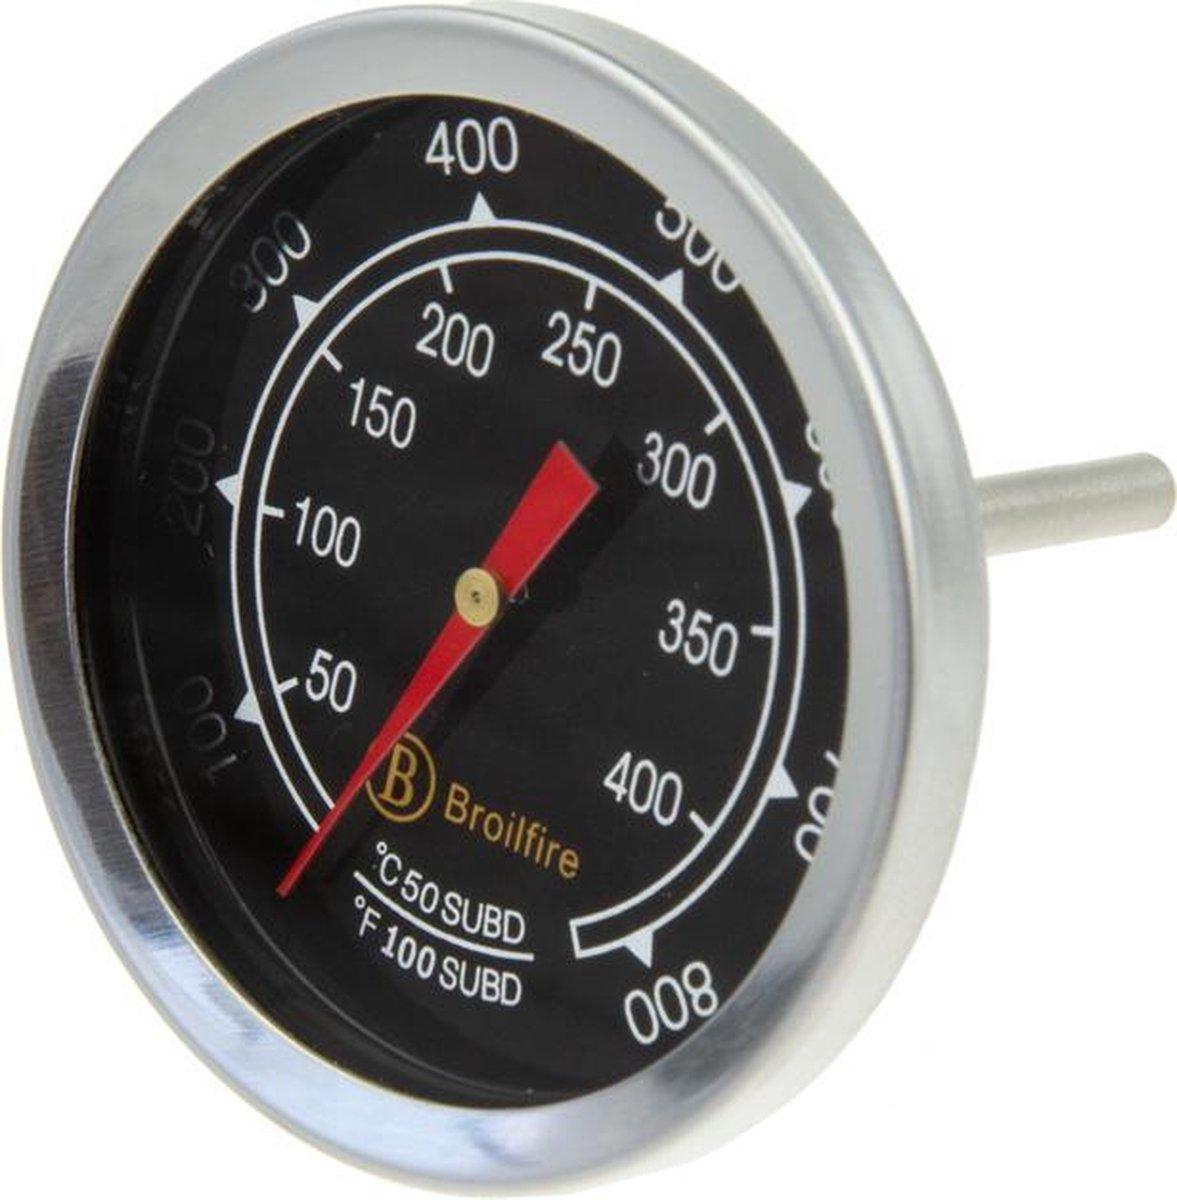 Broilfire RVS thermometer model 1